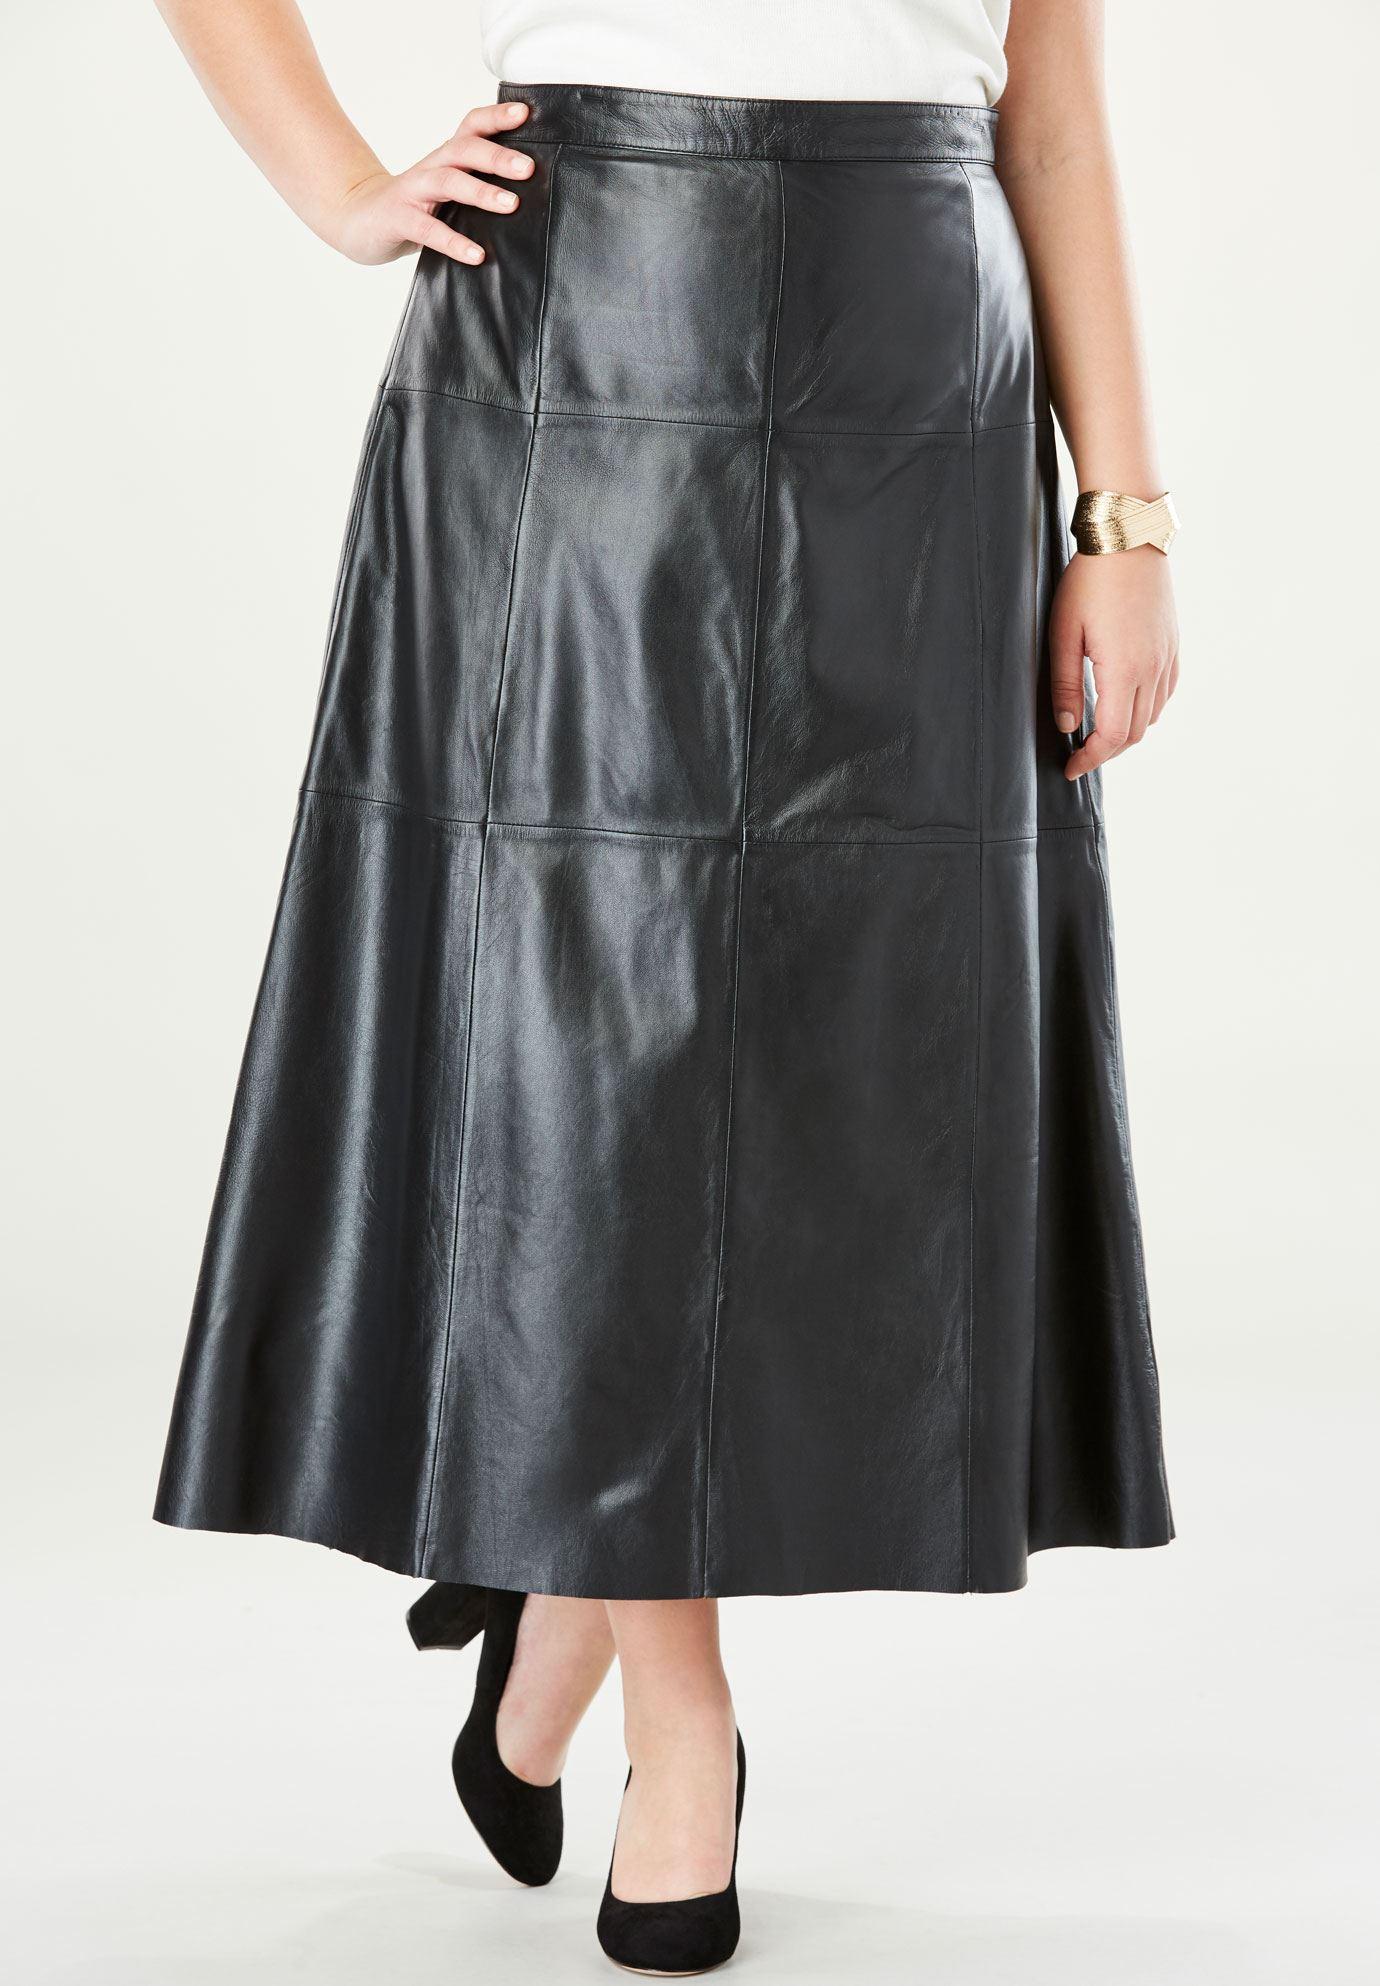 Leather Midi Skirt | Plus Size Skirts | Woman Within - photo #24